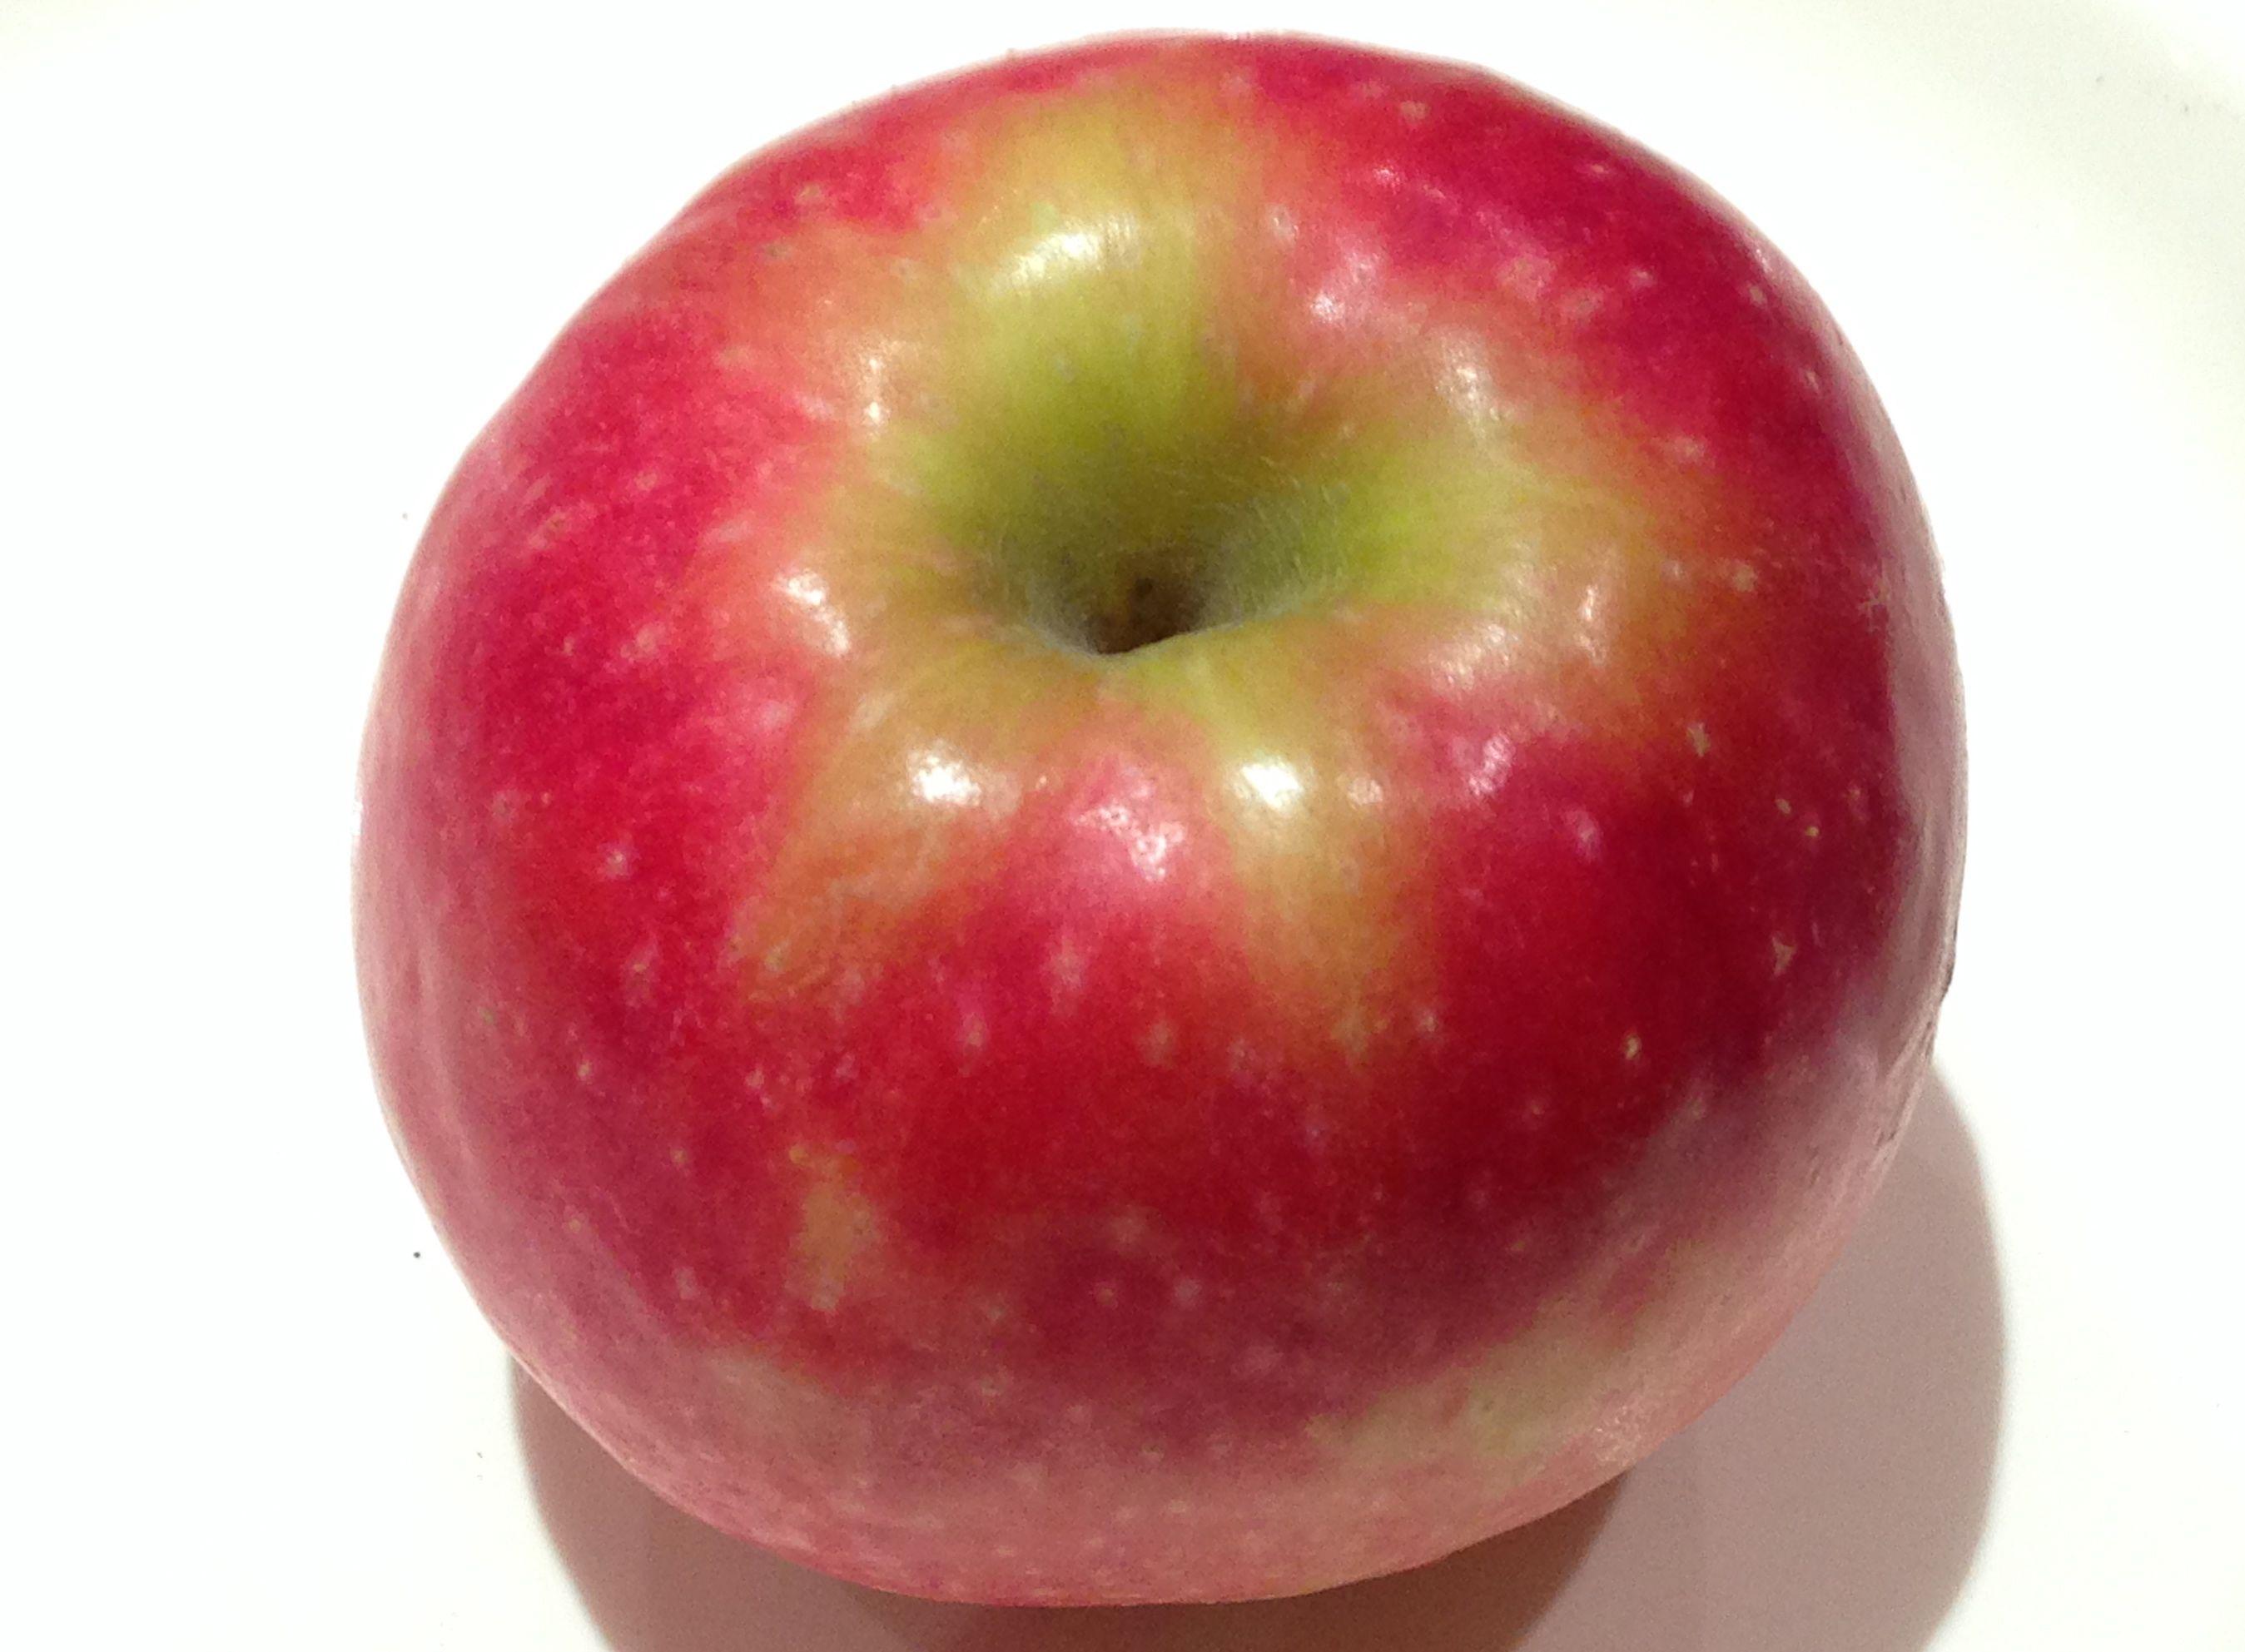 image for a Pomme d'Api apple